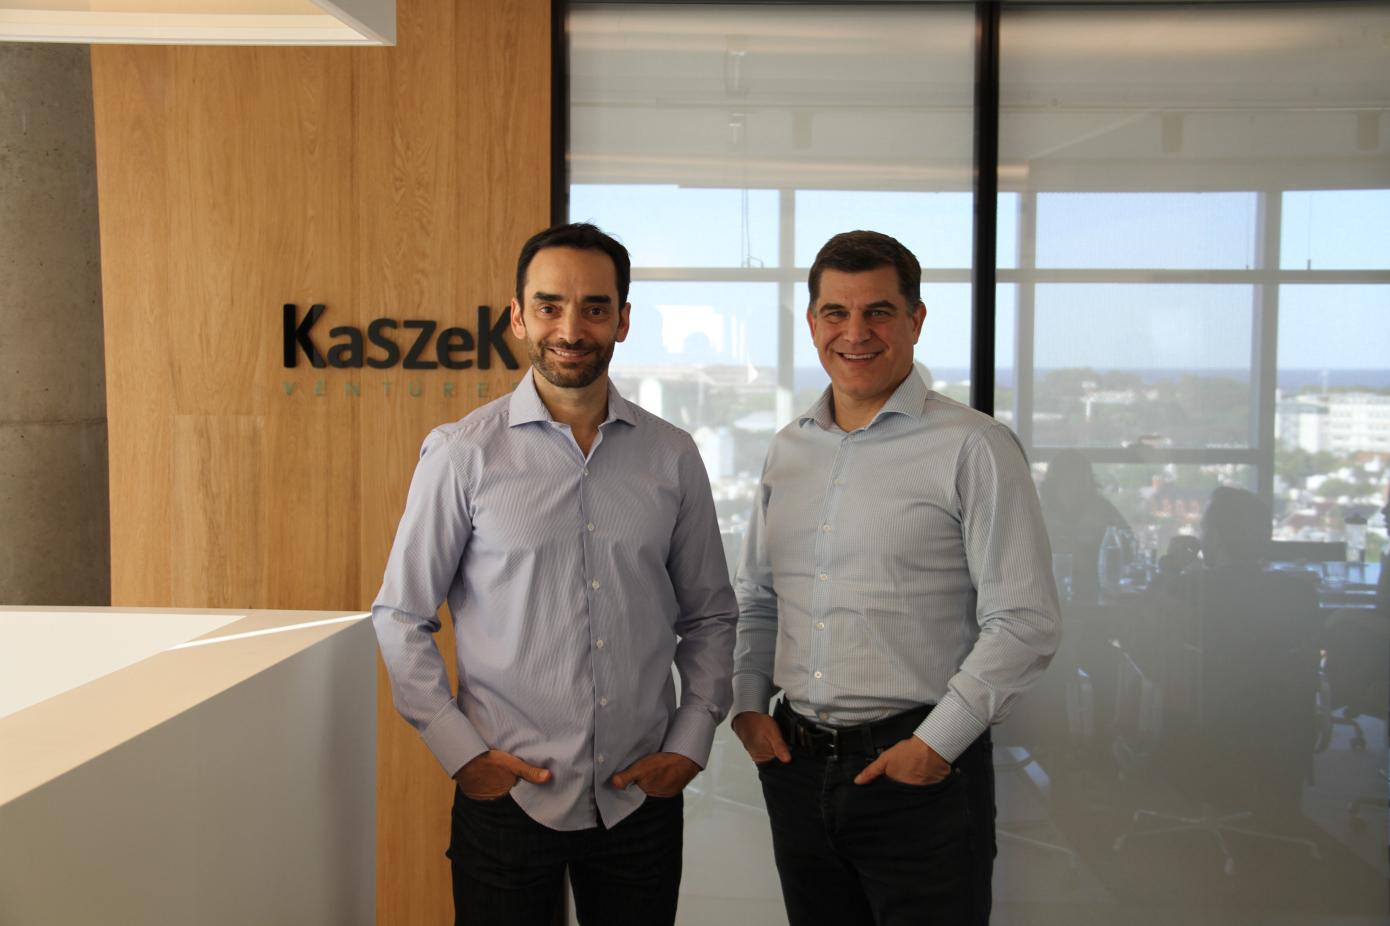 Kaszek, Leading Latin American Venture Firm, Makes First DeFi Investment